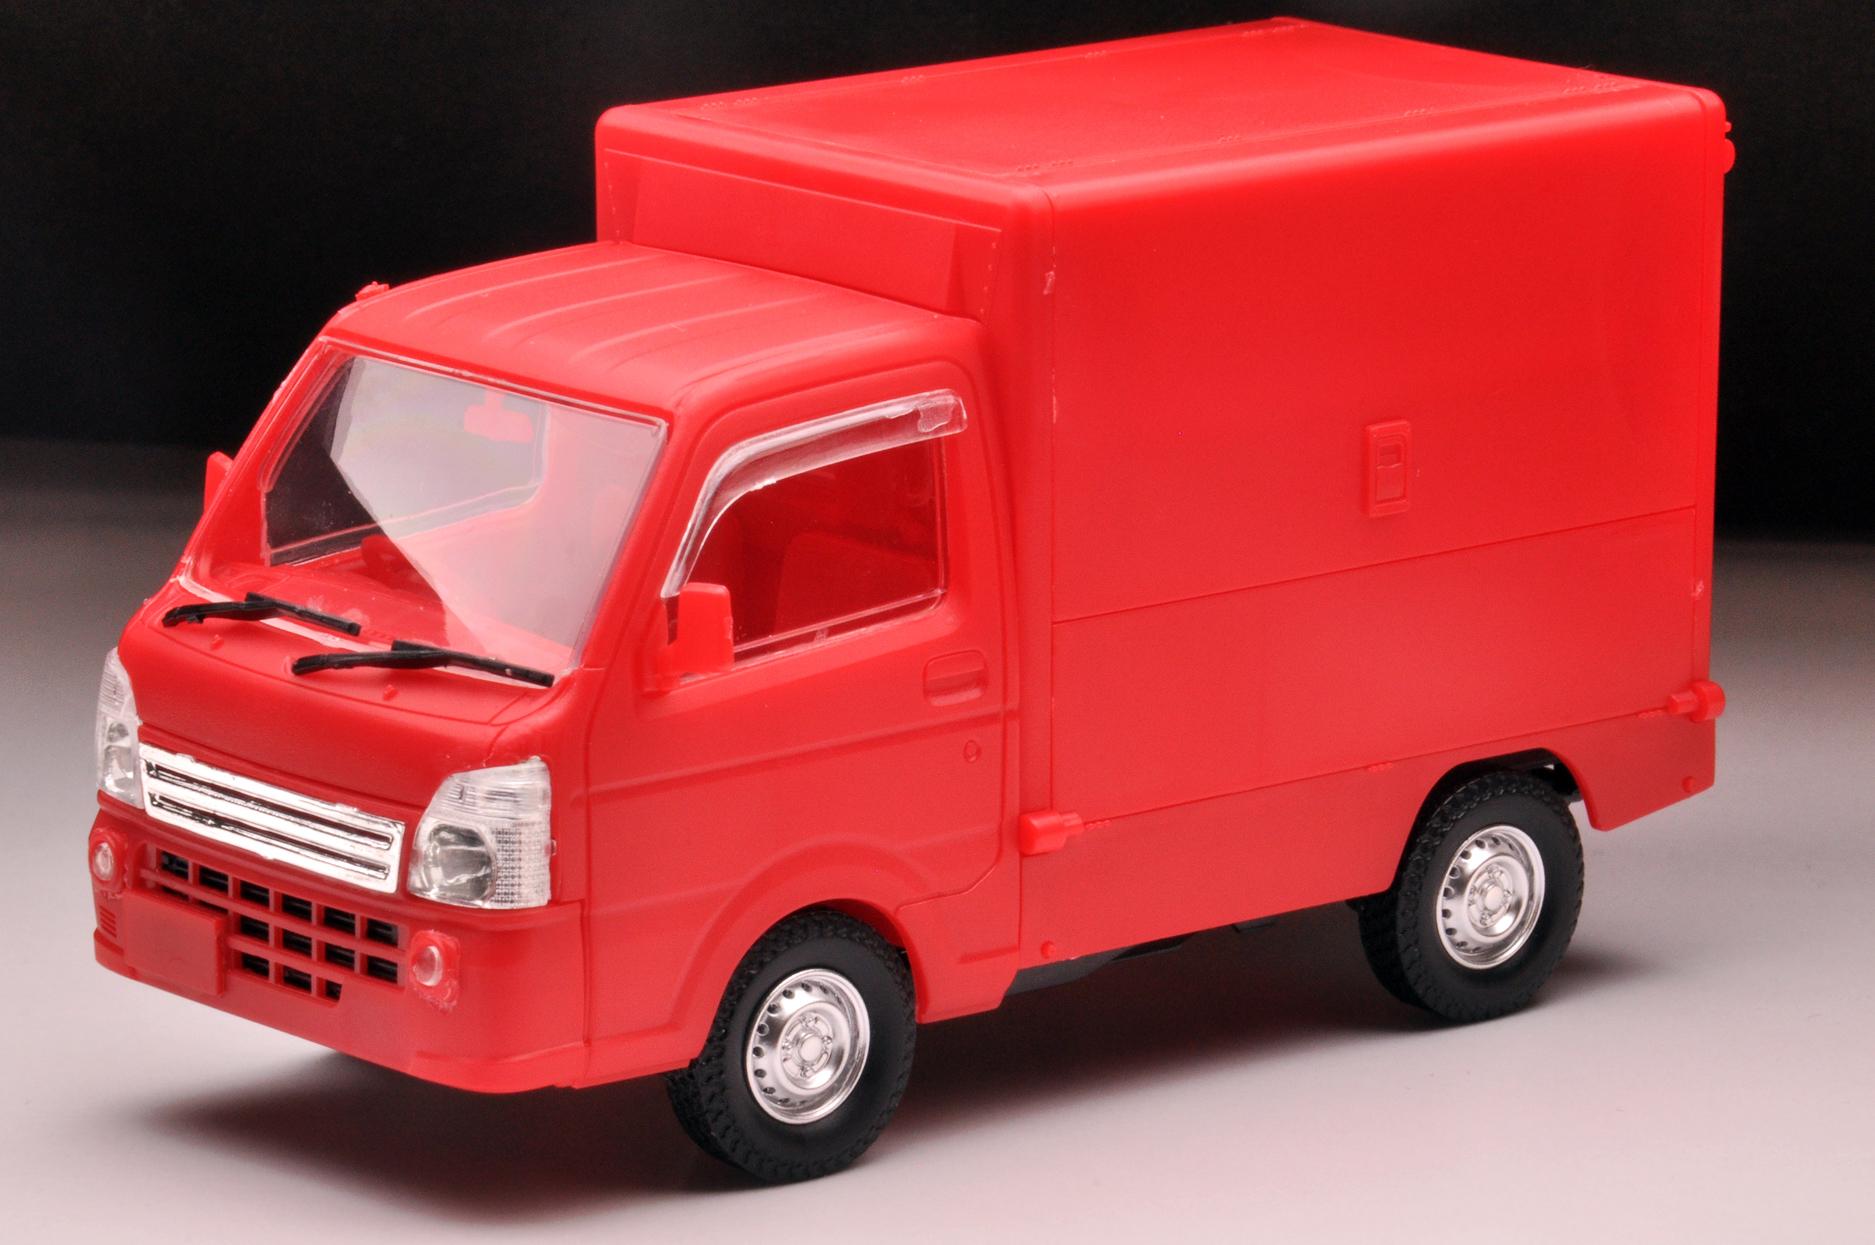 MC-009 マツダスクラム カープショッピングトラック